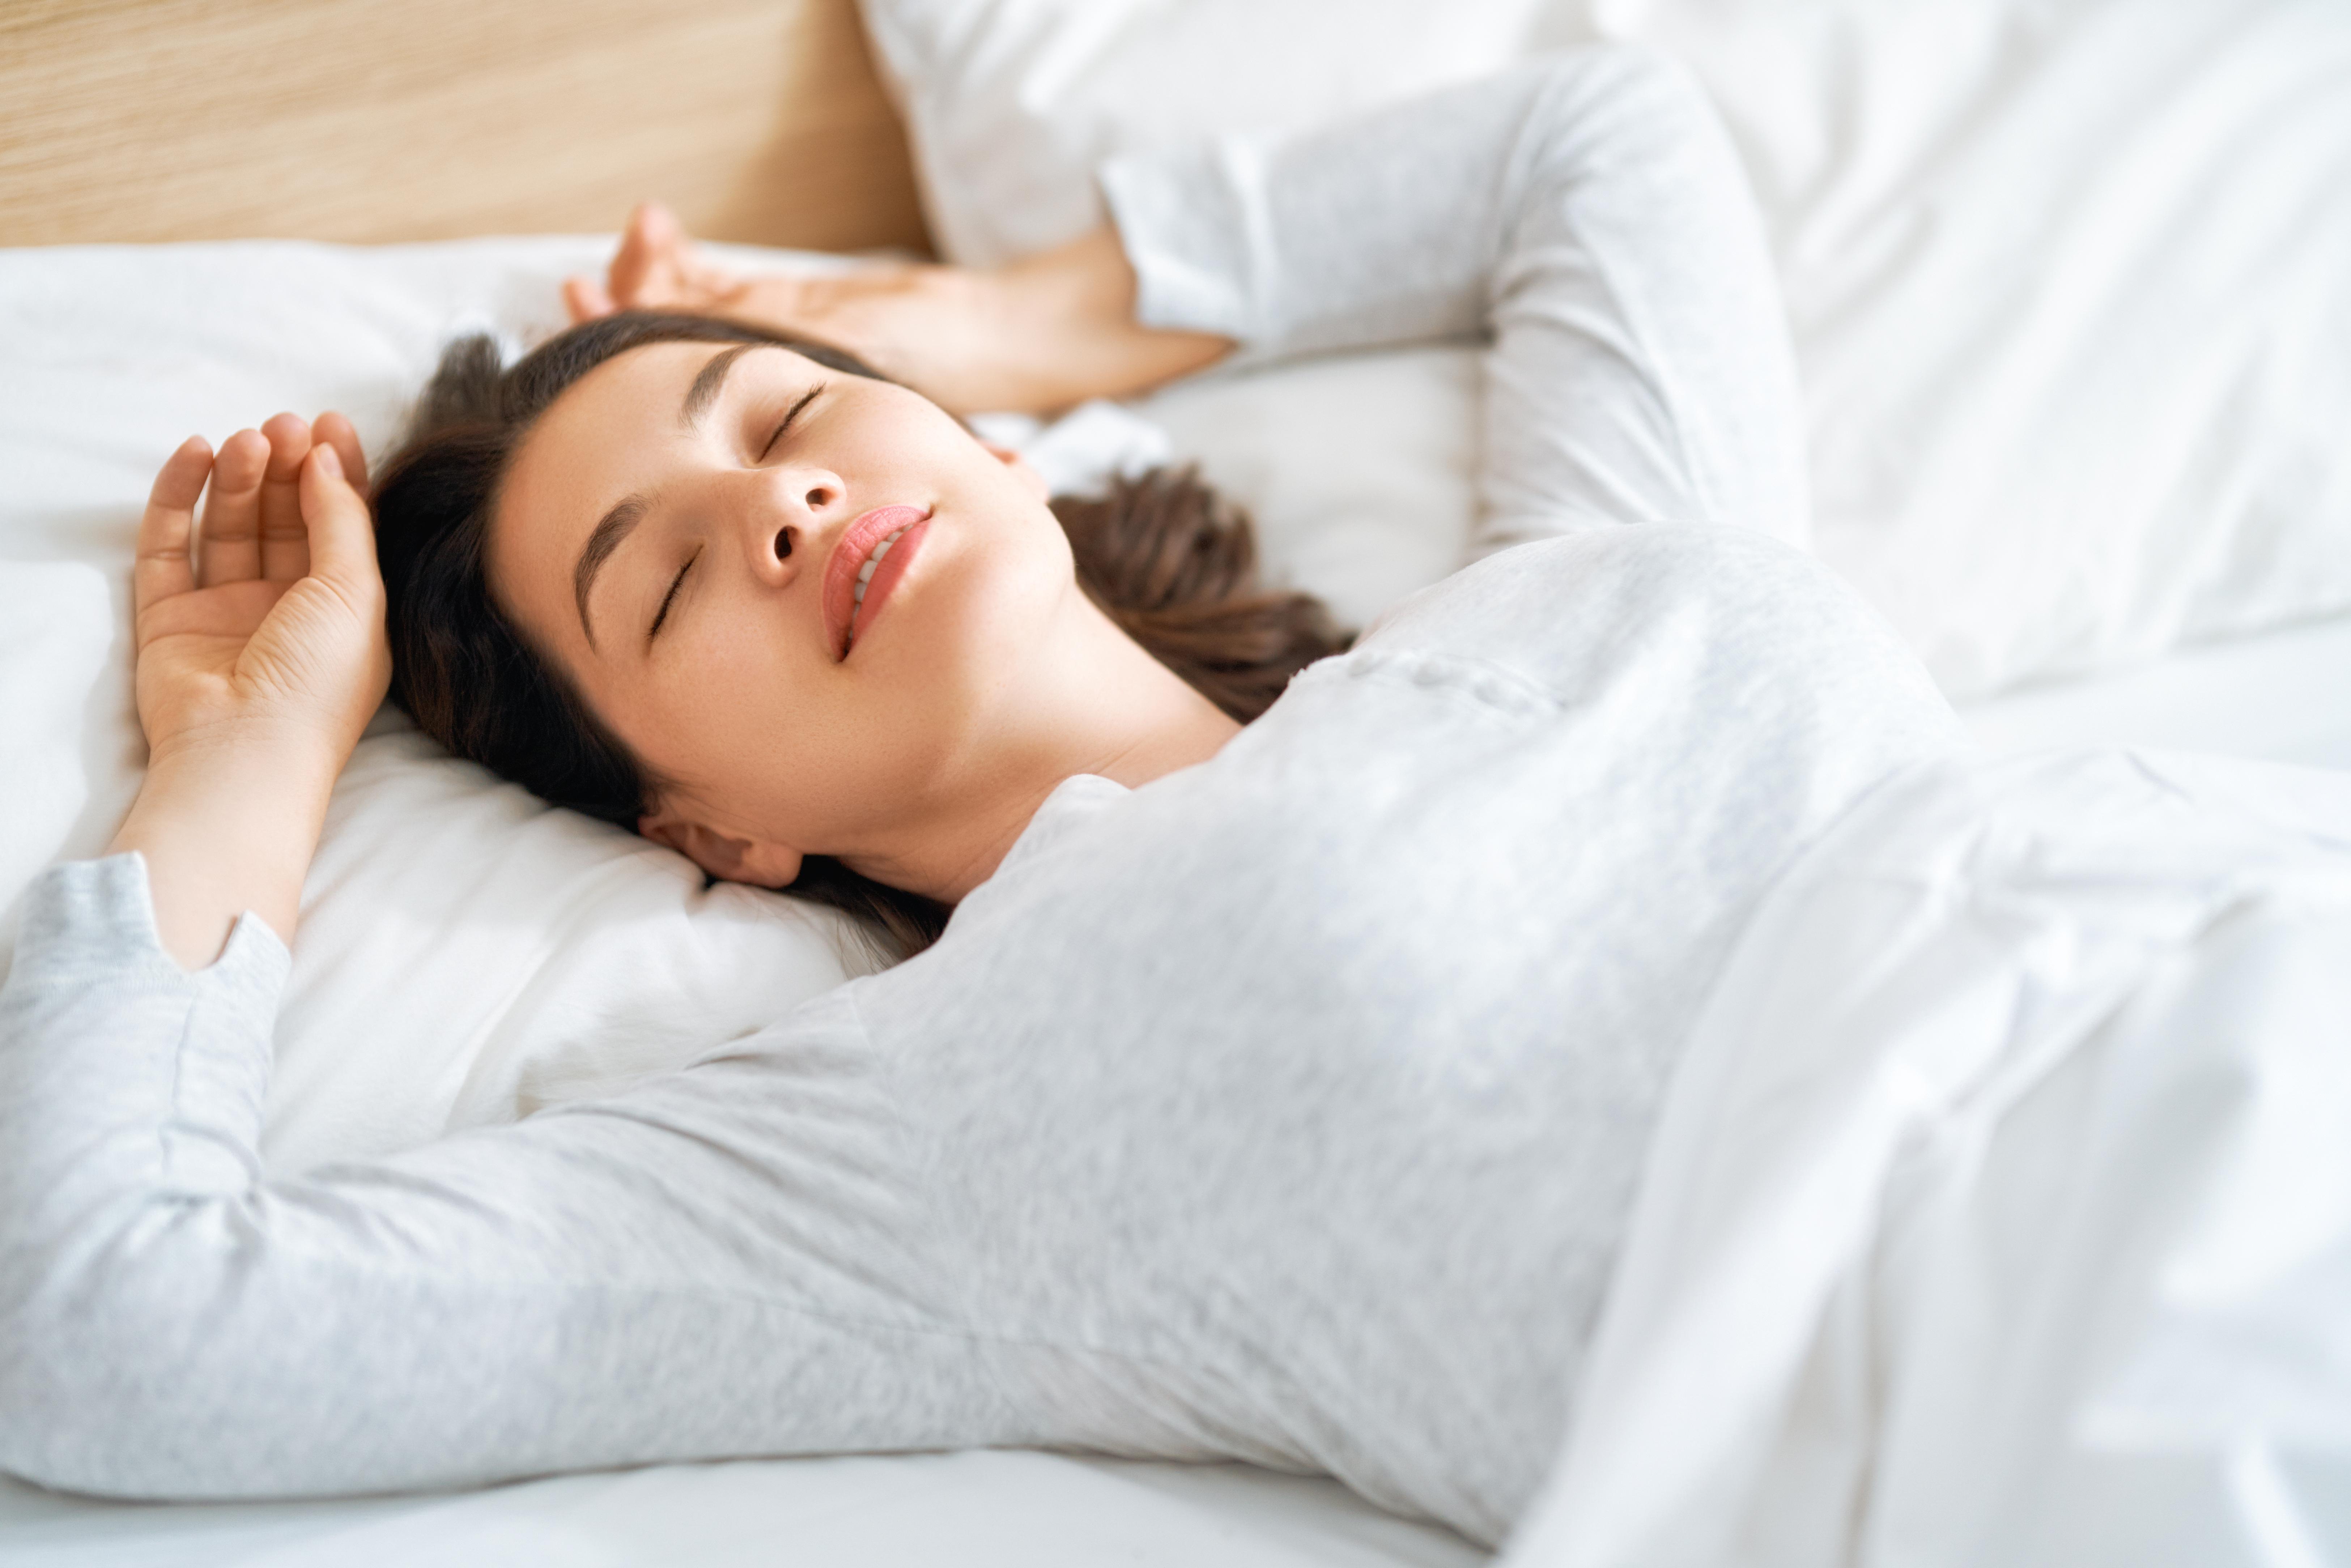 sleeping-woman-MPR64CX